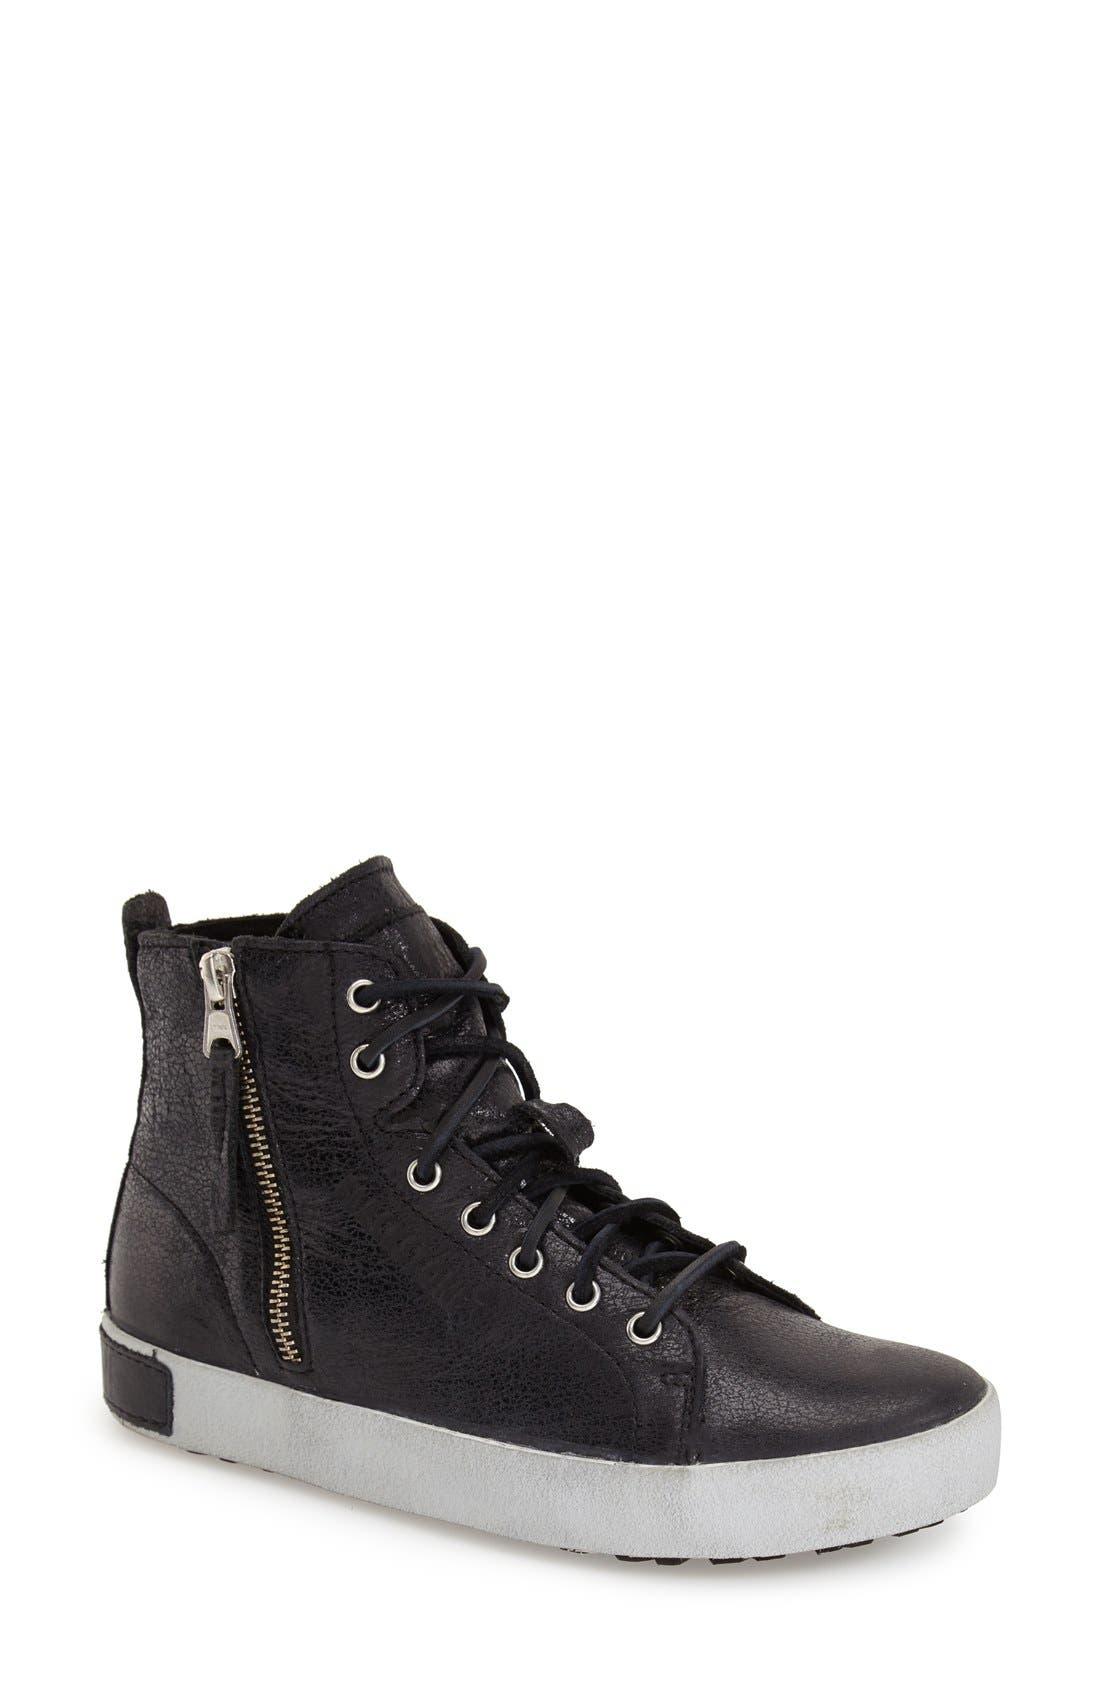 'KL57' High Top Sneaker,                             Main thumbnail 1, color,                             Caviar Black Leather